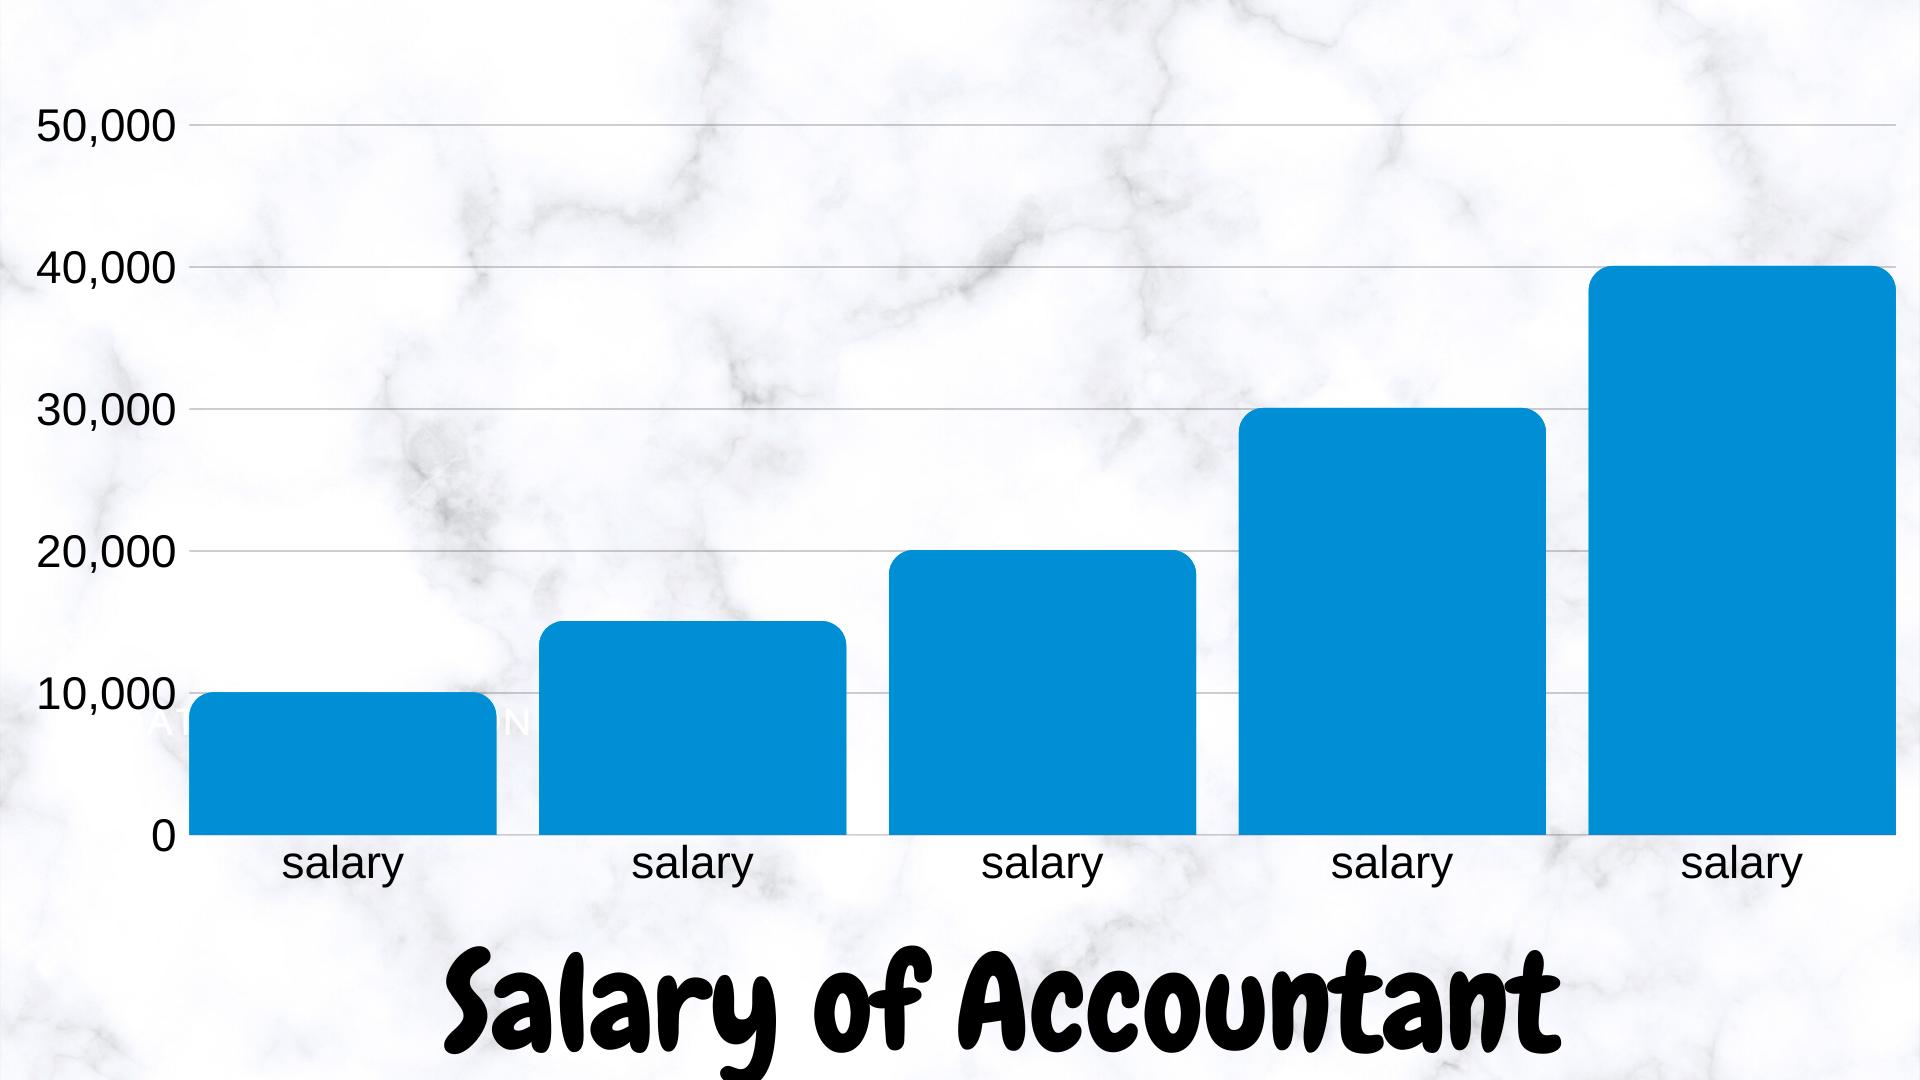 salary of an accountant